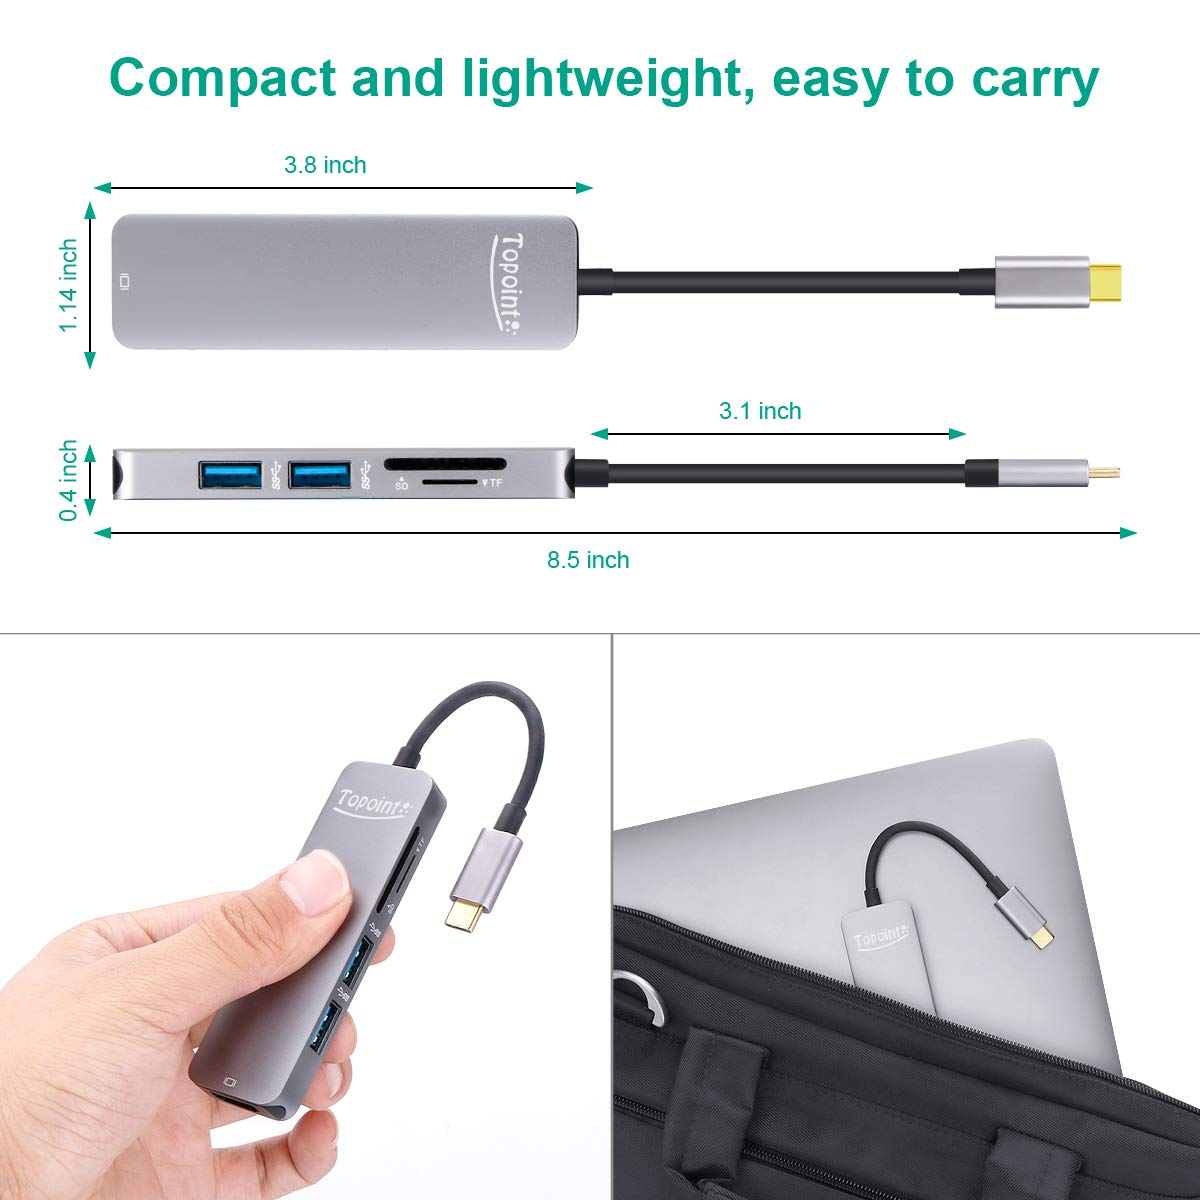 WU-MINGLU USB C Hub,5 in 1 Thunderbolt 3 auf HDMI 4k Adapter mit 2 USB 3.0 SD/TF Kartenleser,Typ C Konverter für MacBook/MacBook Pro 2018/2017/2016/2015,Samsung S8/S9,Dell XPS,Acer